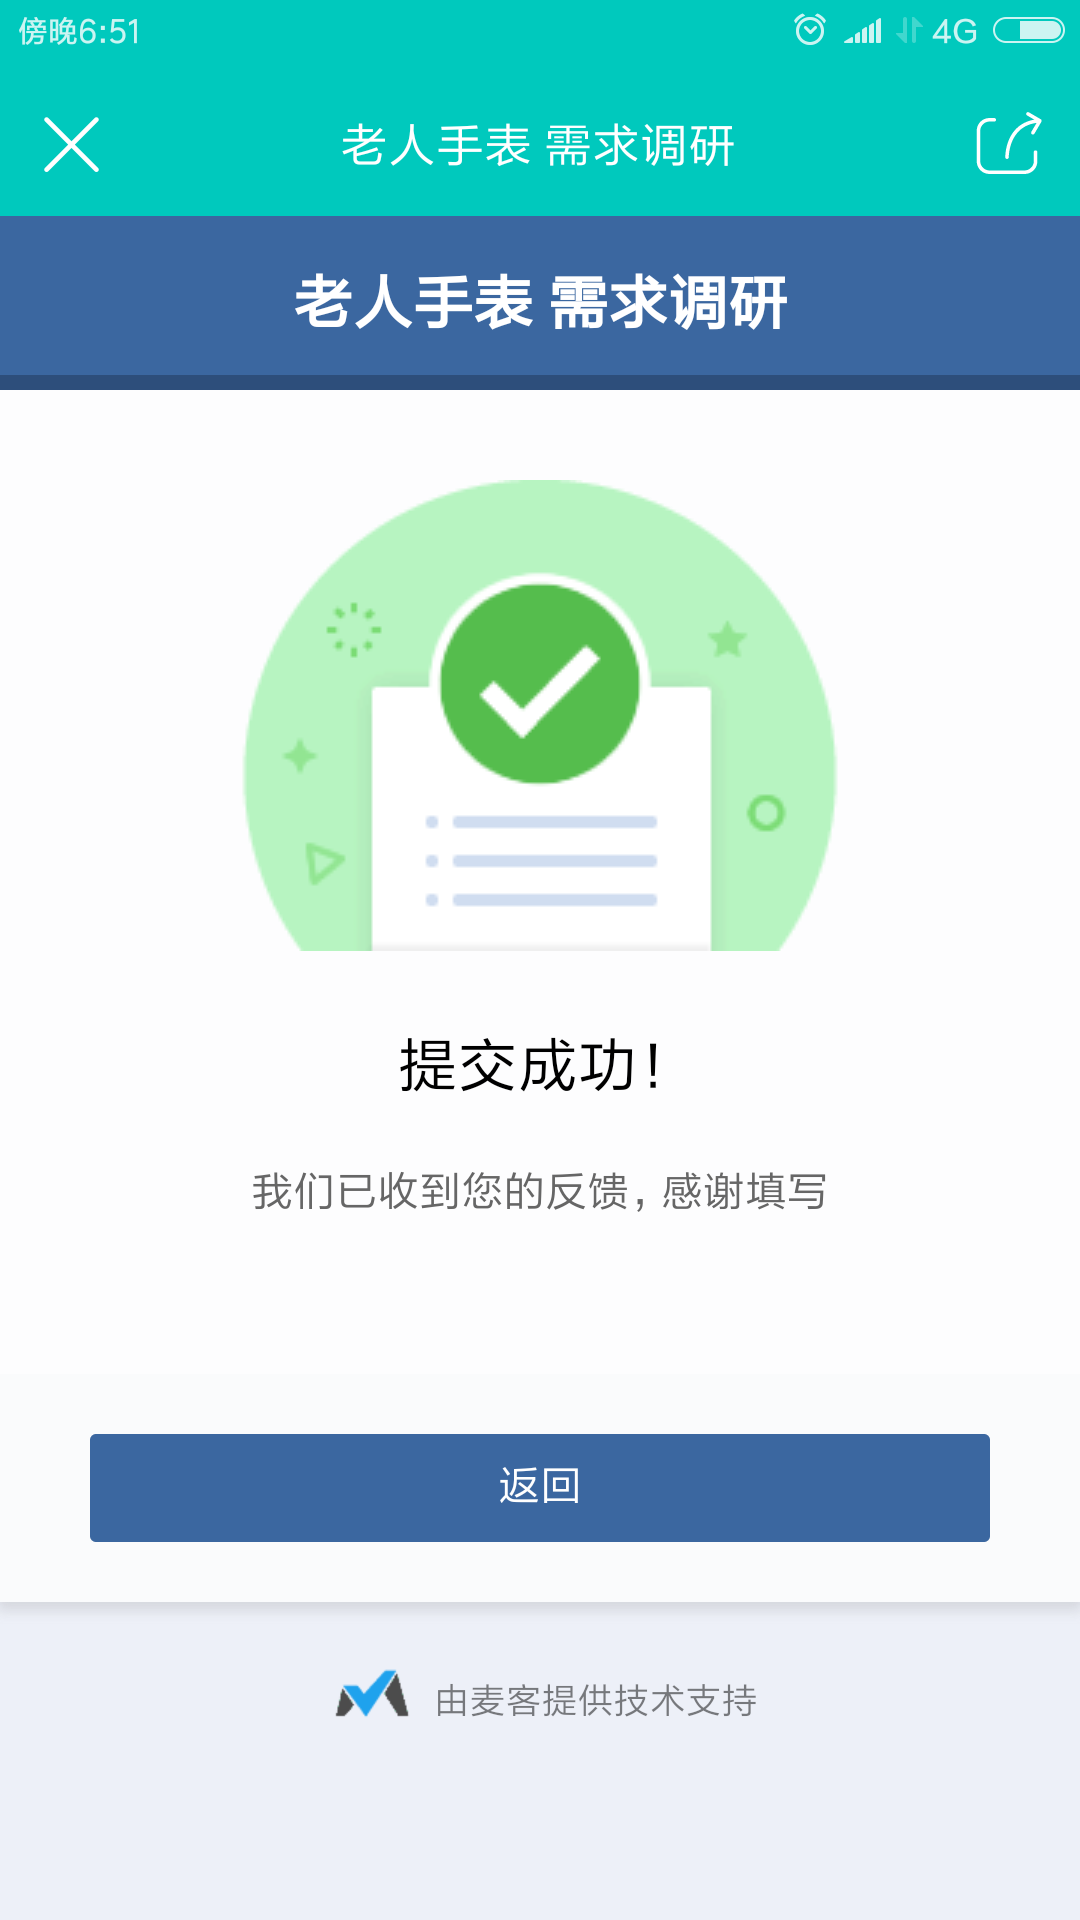 Screenshot_2018-08-03-18-51-20-232_com.qiku.bbs.png